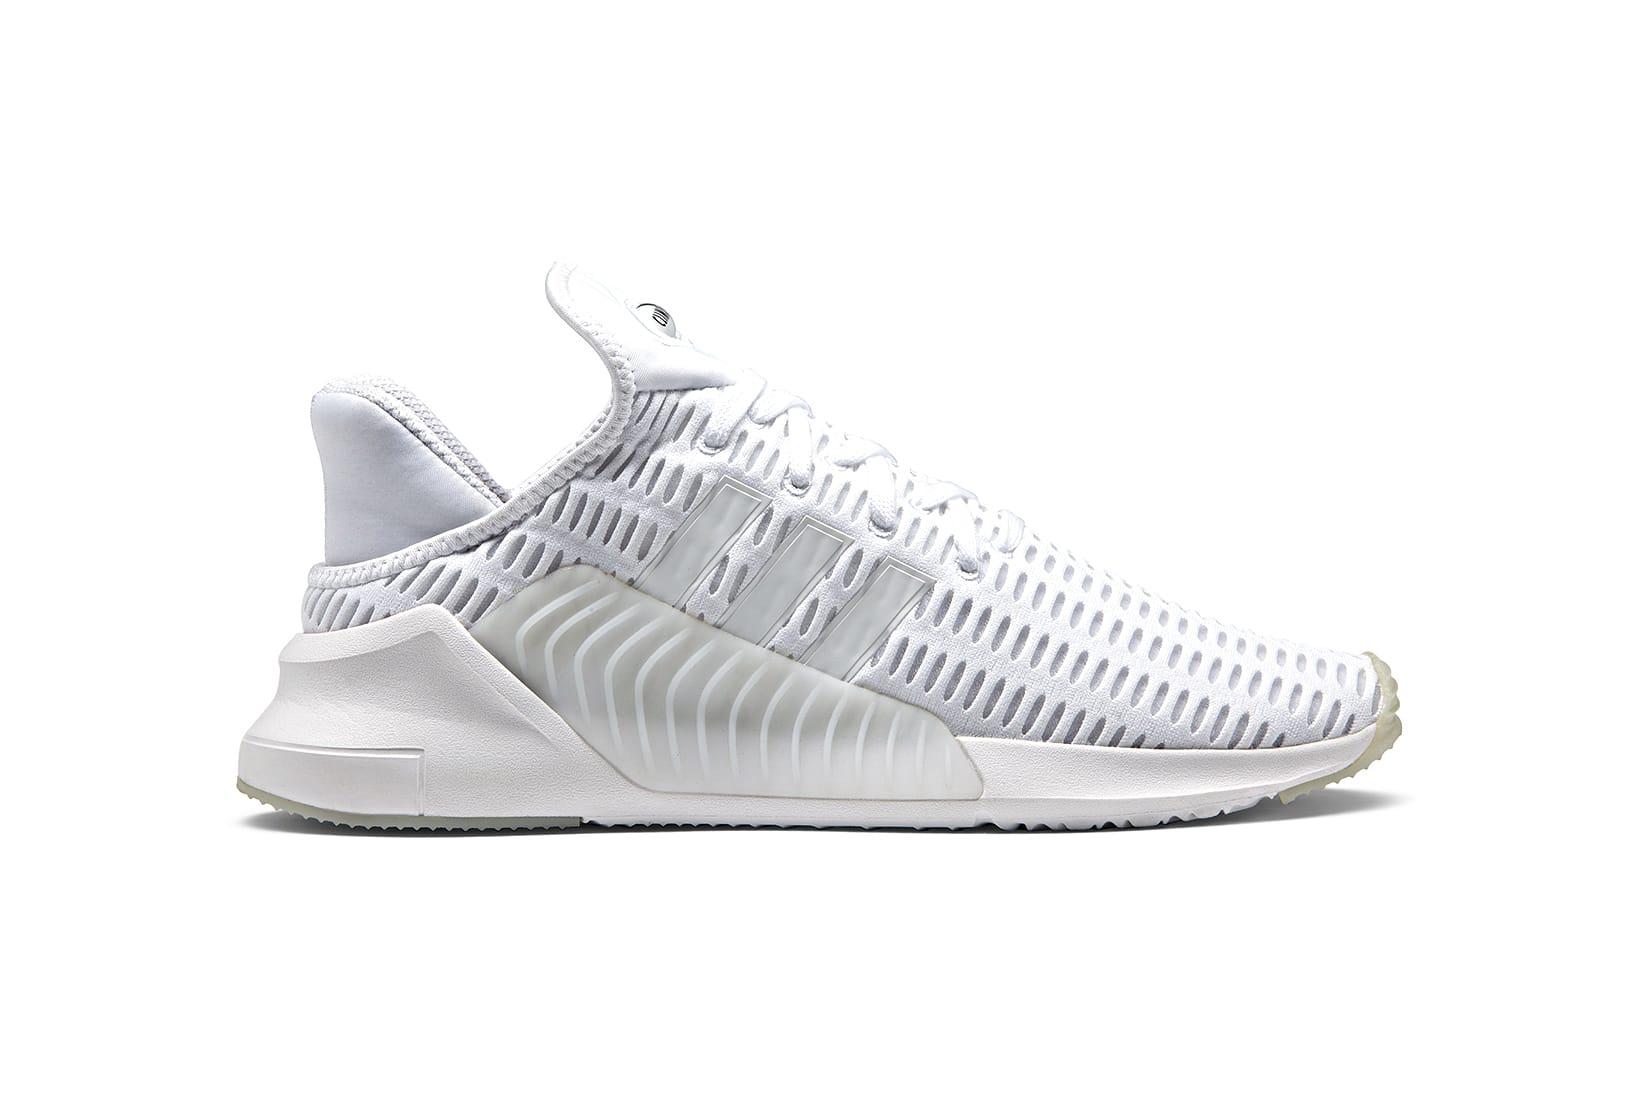 adidas climacool shoes 2017